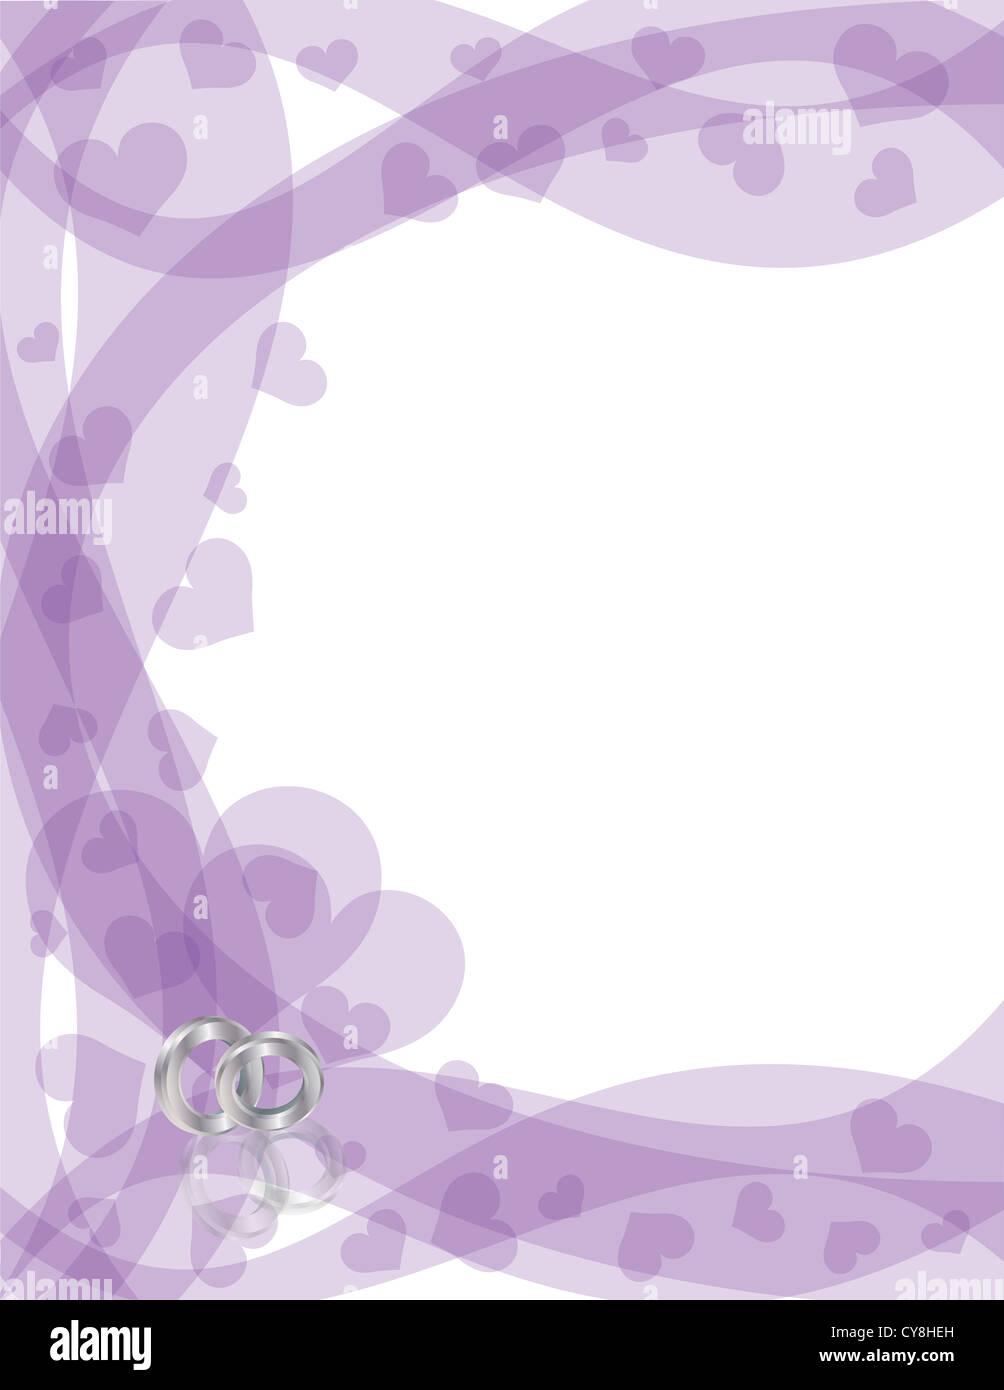 Wedding Rings Platinum Band On Purple Swirls Border With Flying